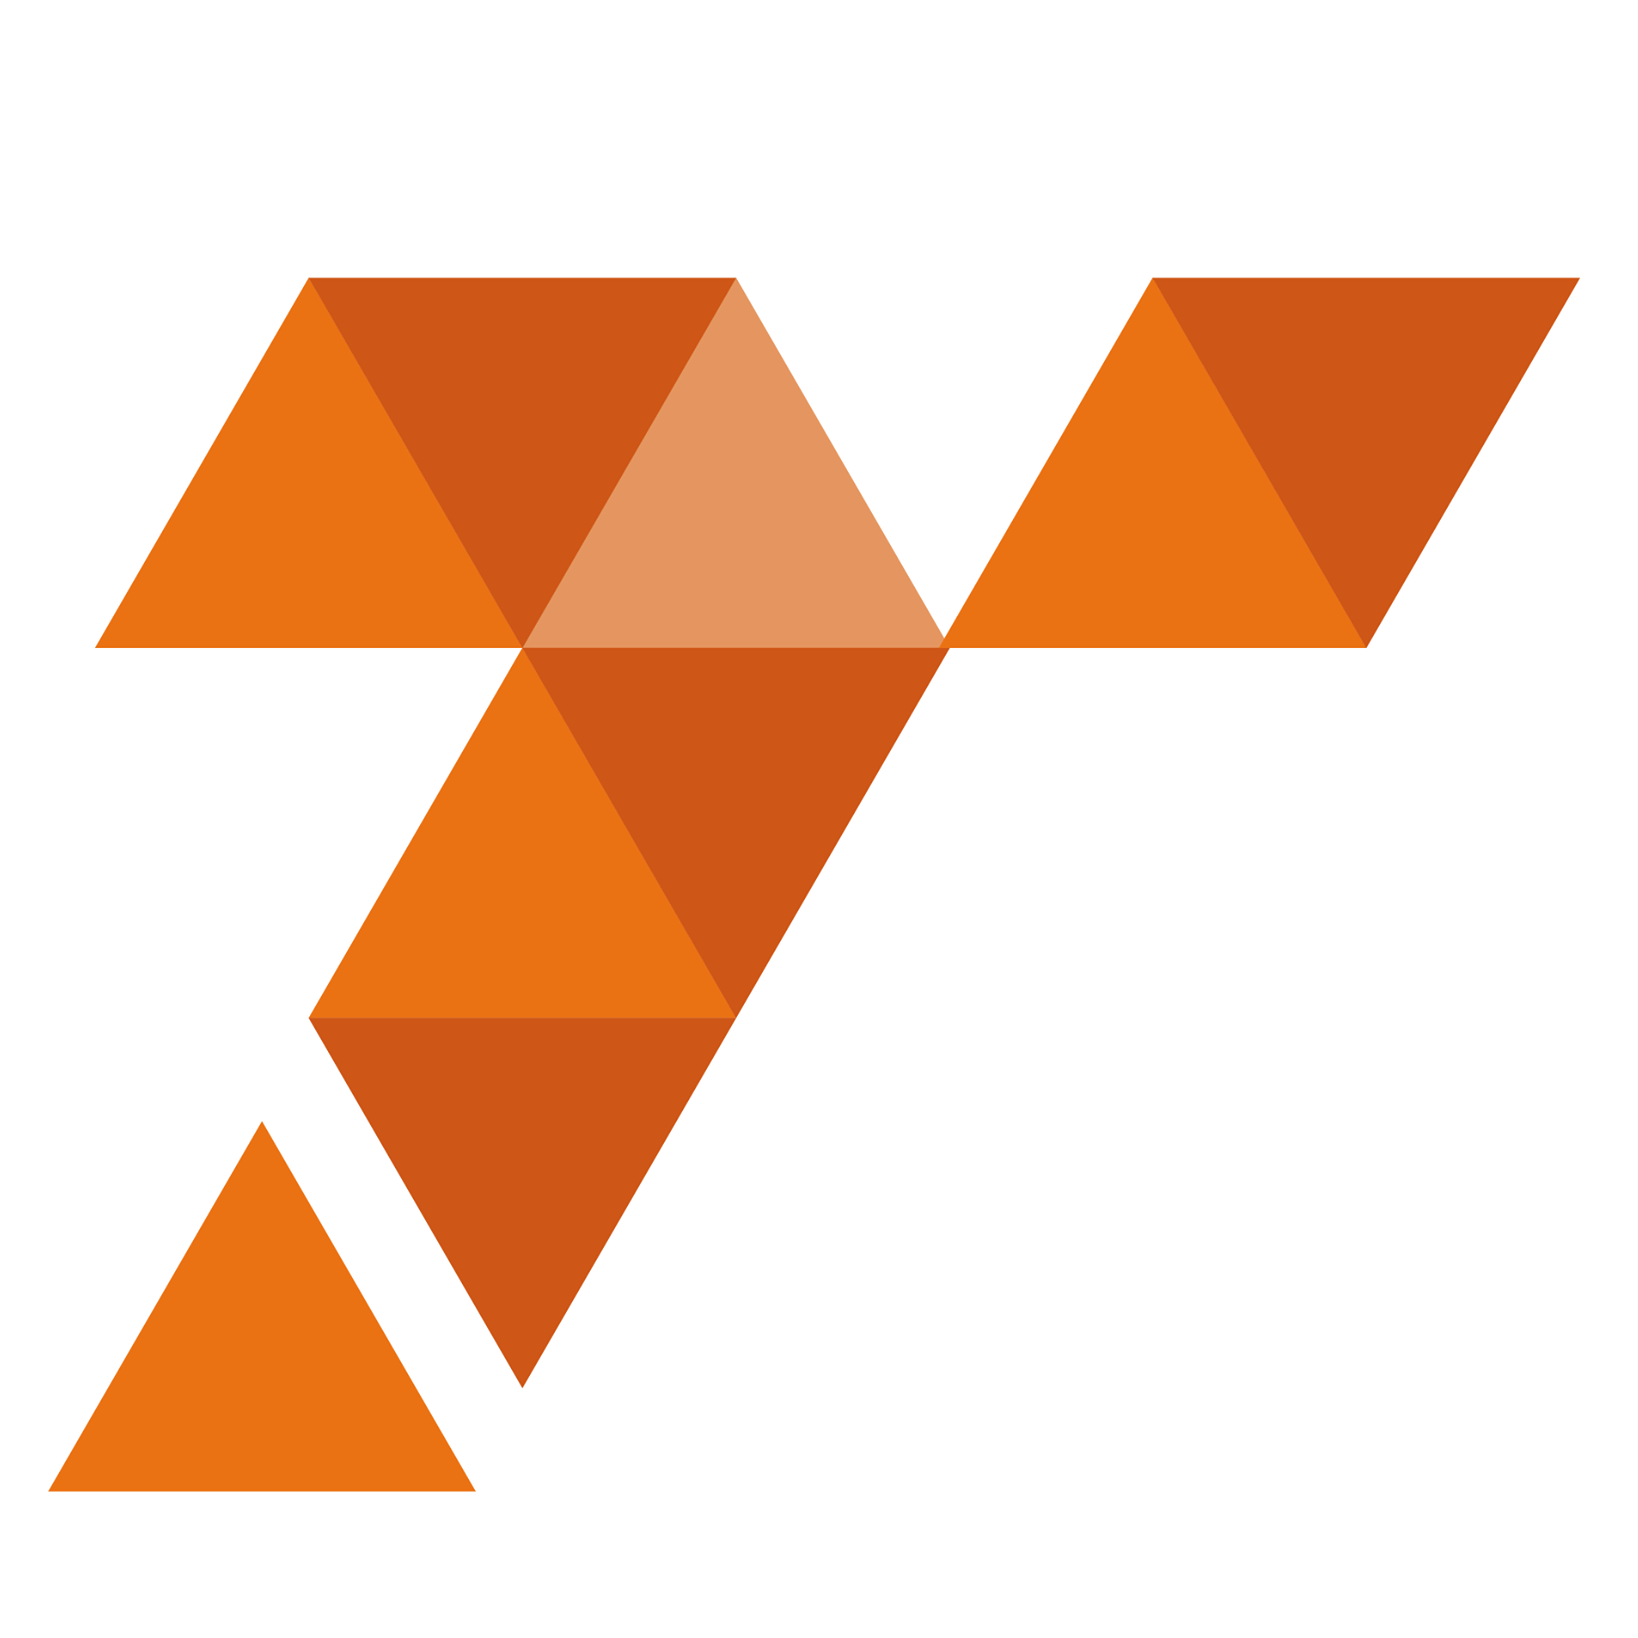 Trucksters's logo